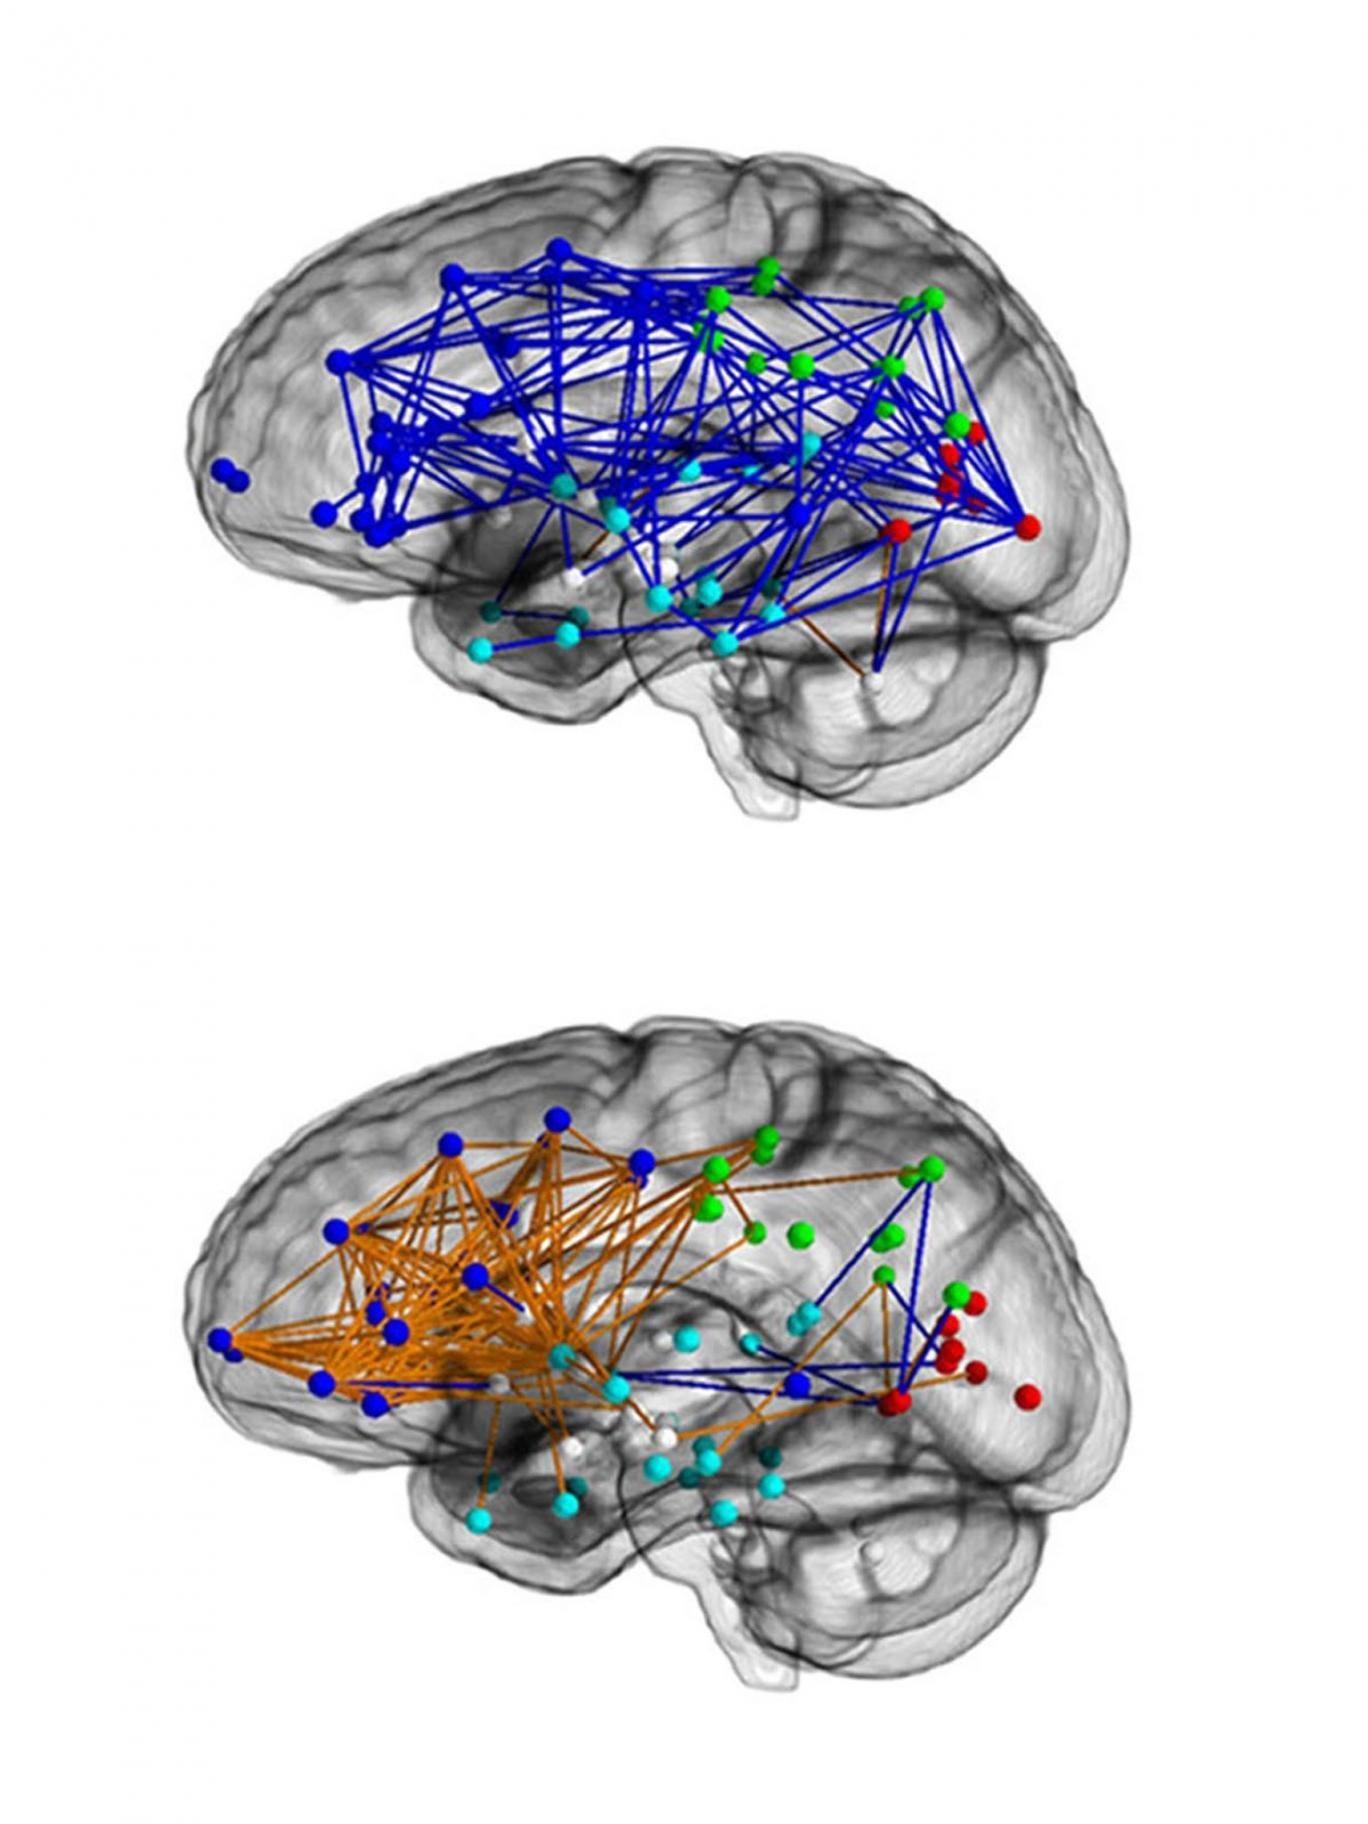 brain wiring definition basic wiring diagram u2022 rh rnetcomputer co Train Your Brain Brain Wiring Connections